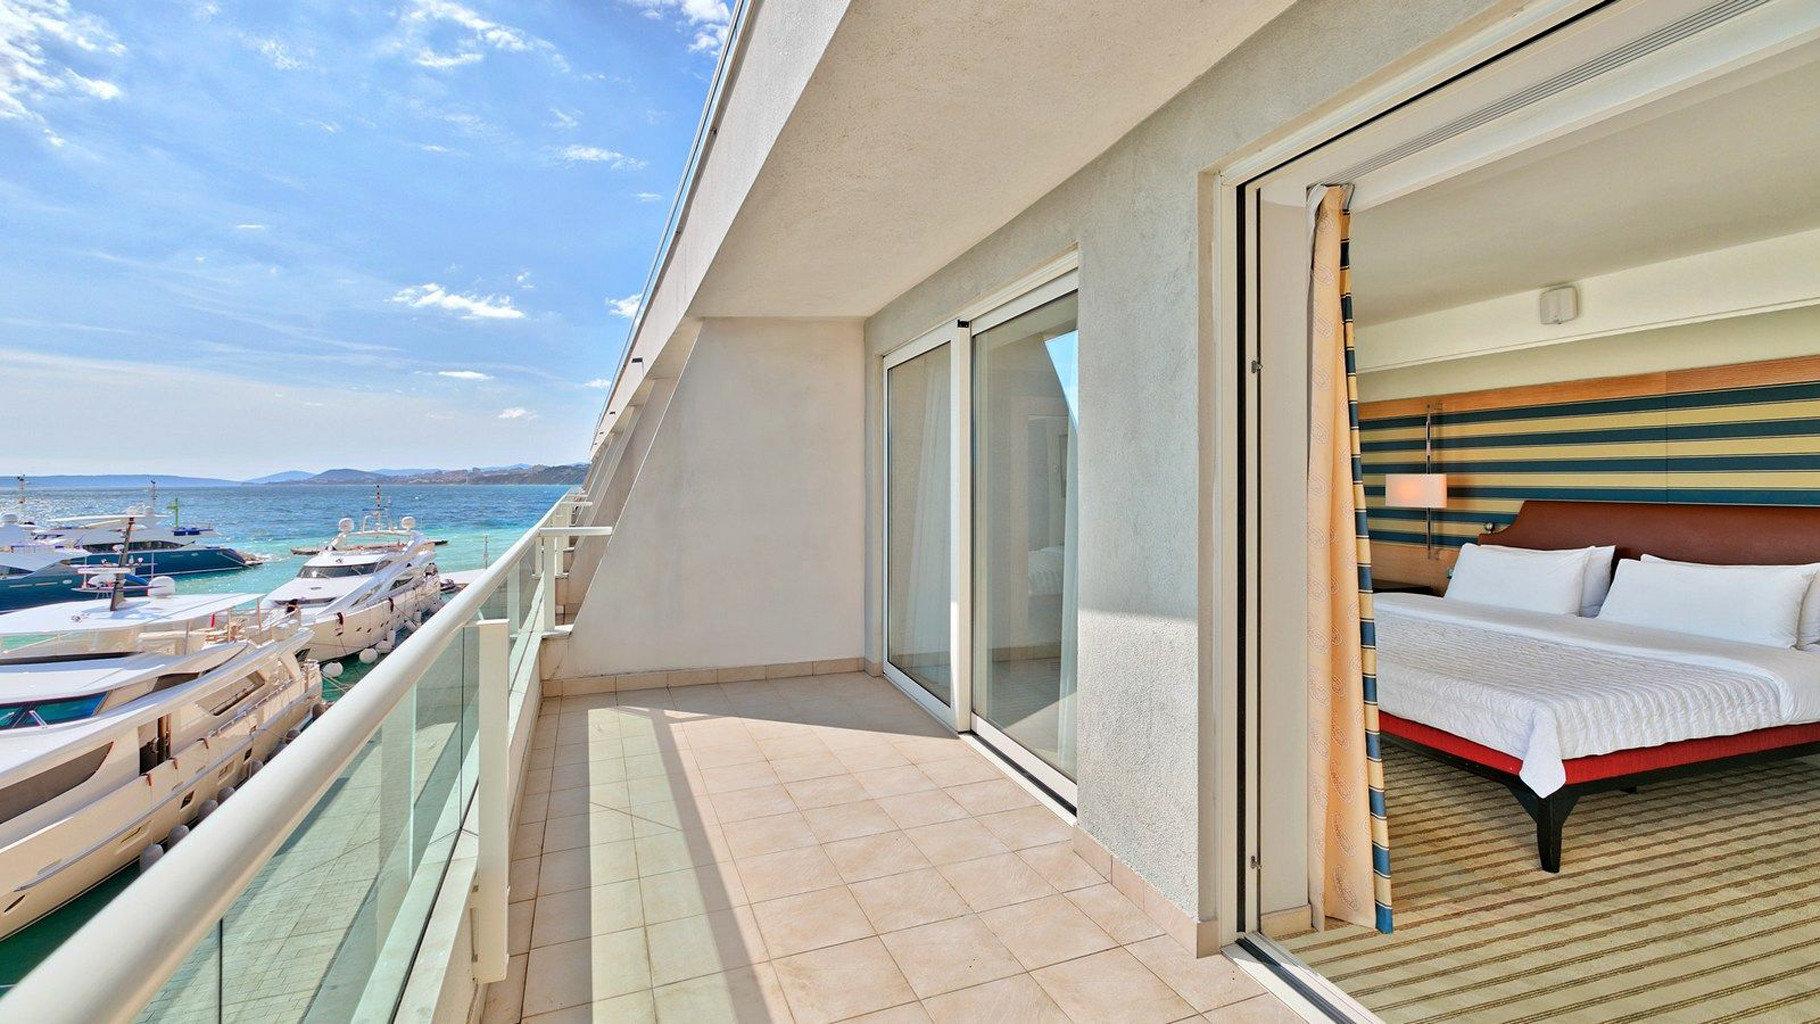 property building Villa yacht Balcony cottage Deck